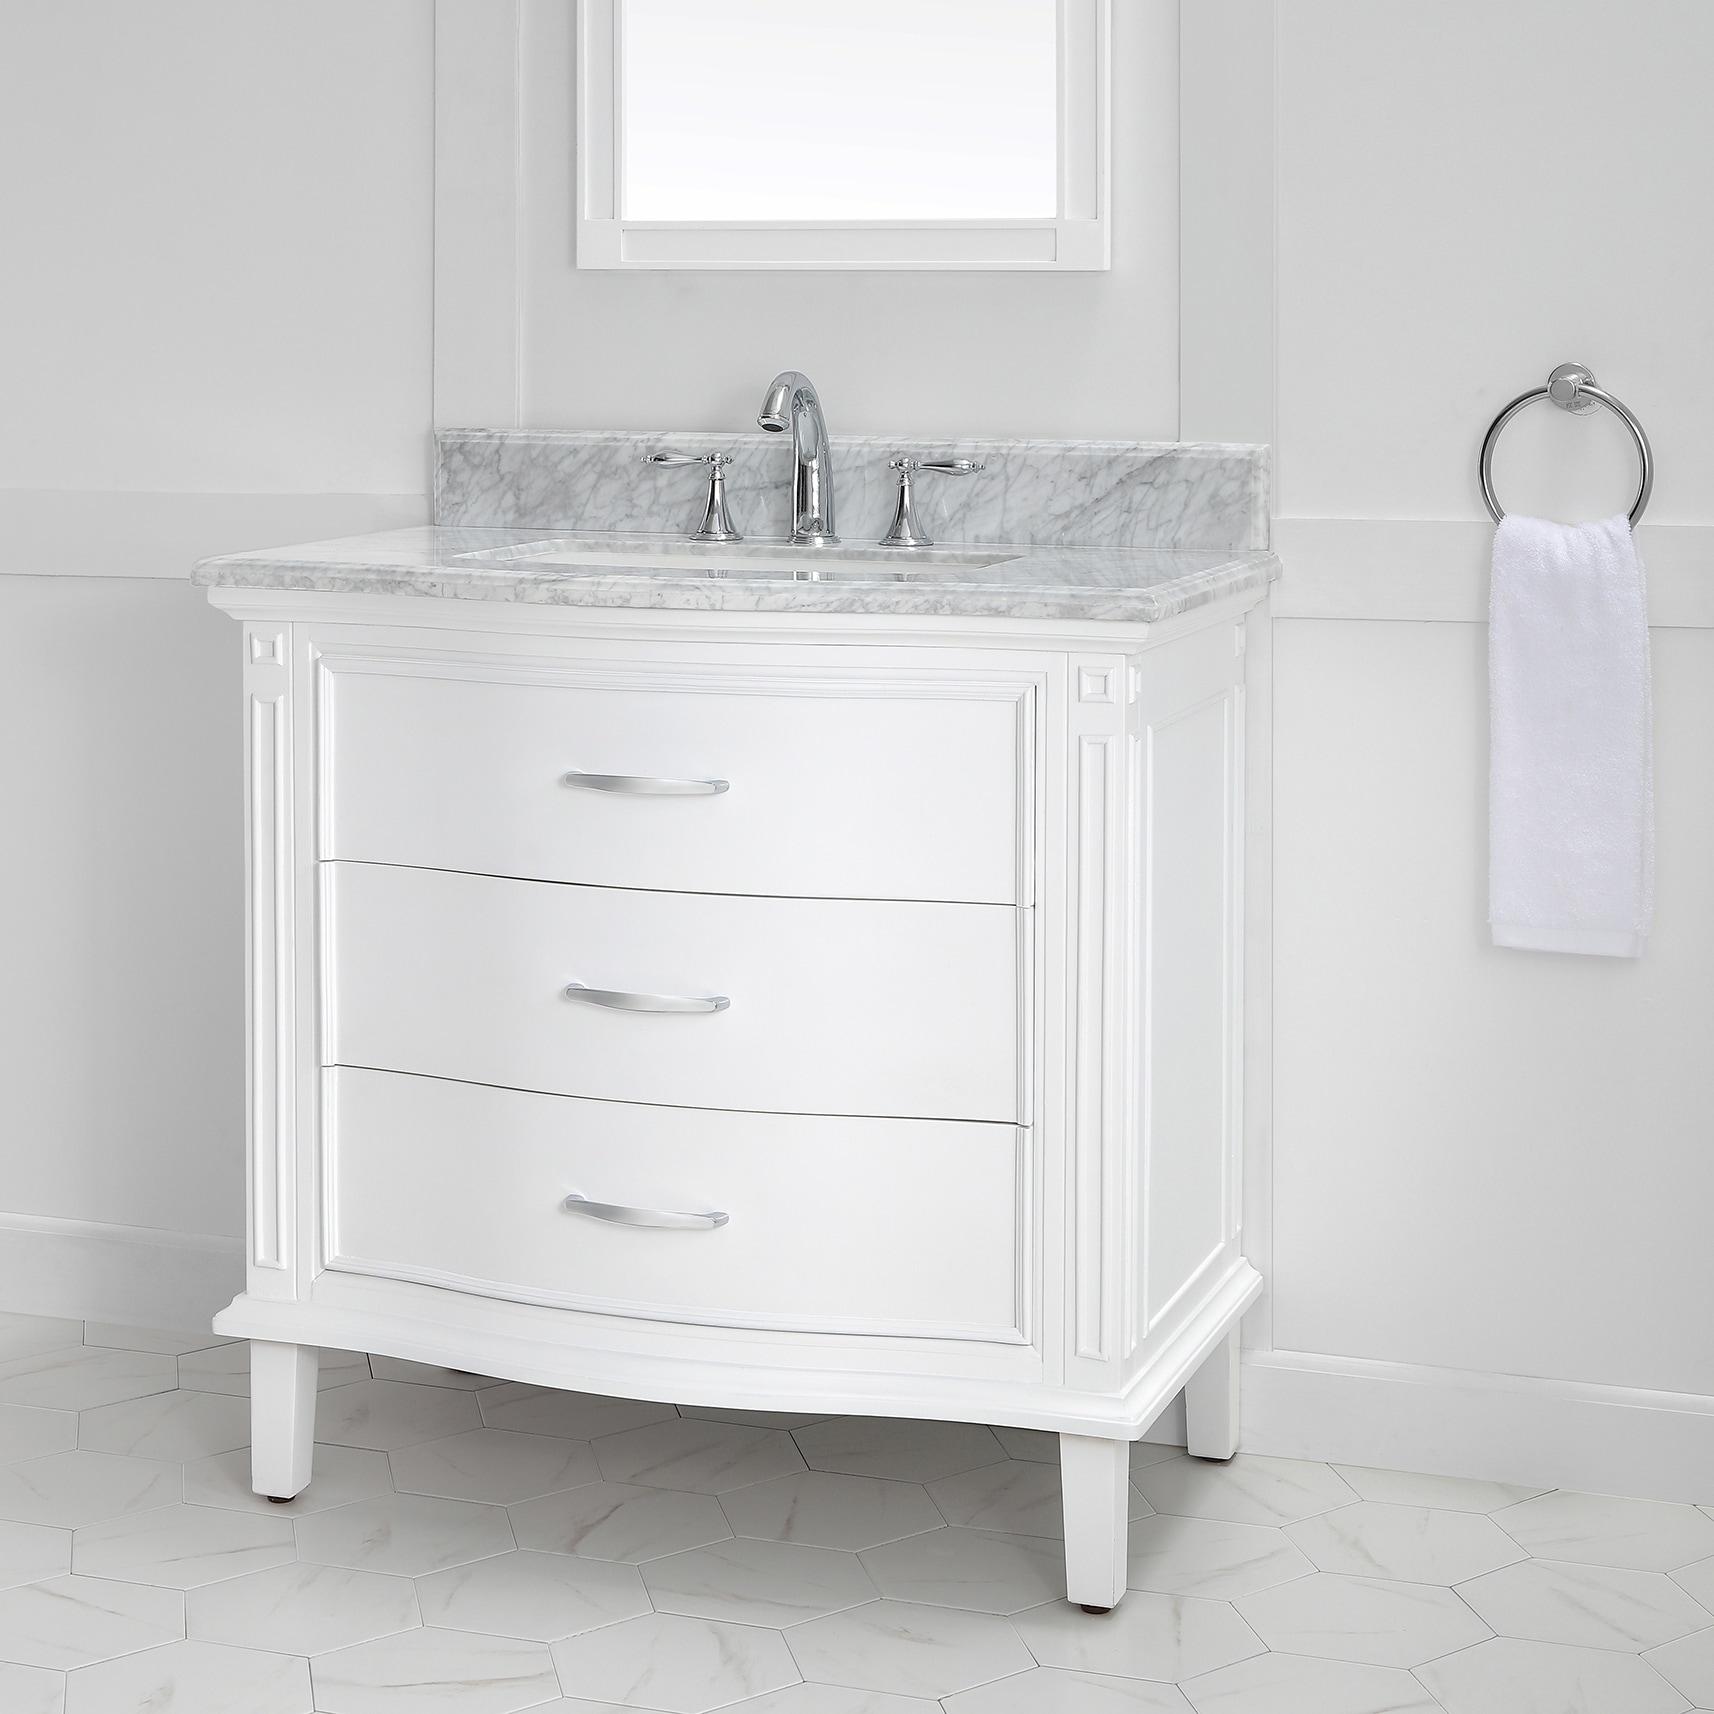 Mira 36 In X 22 Single Vanity Carrara Marble Top White Ceramic Basin